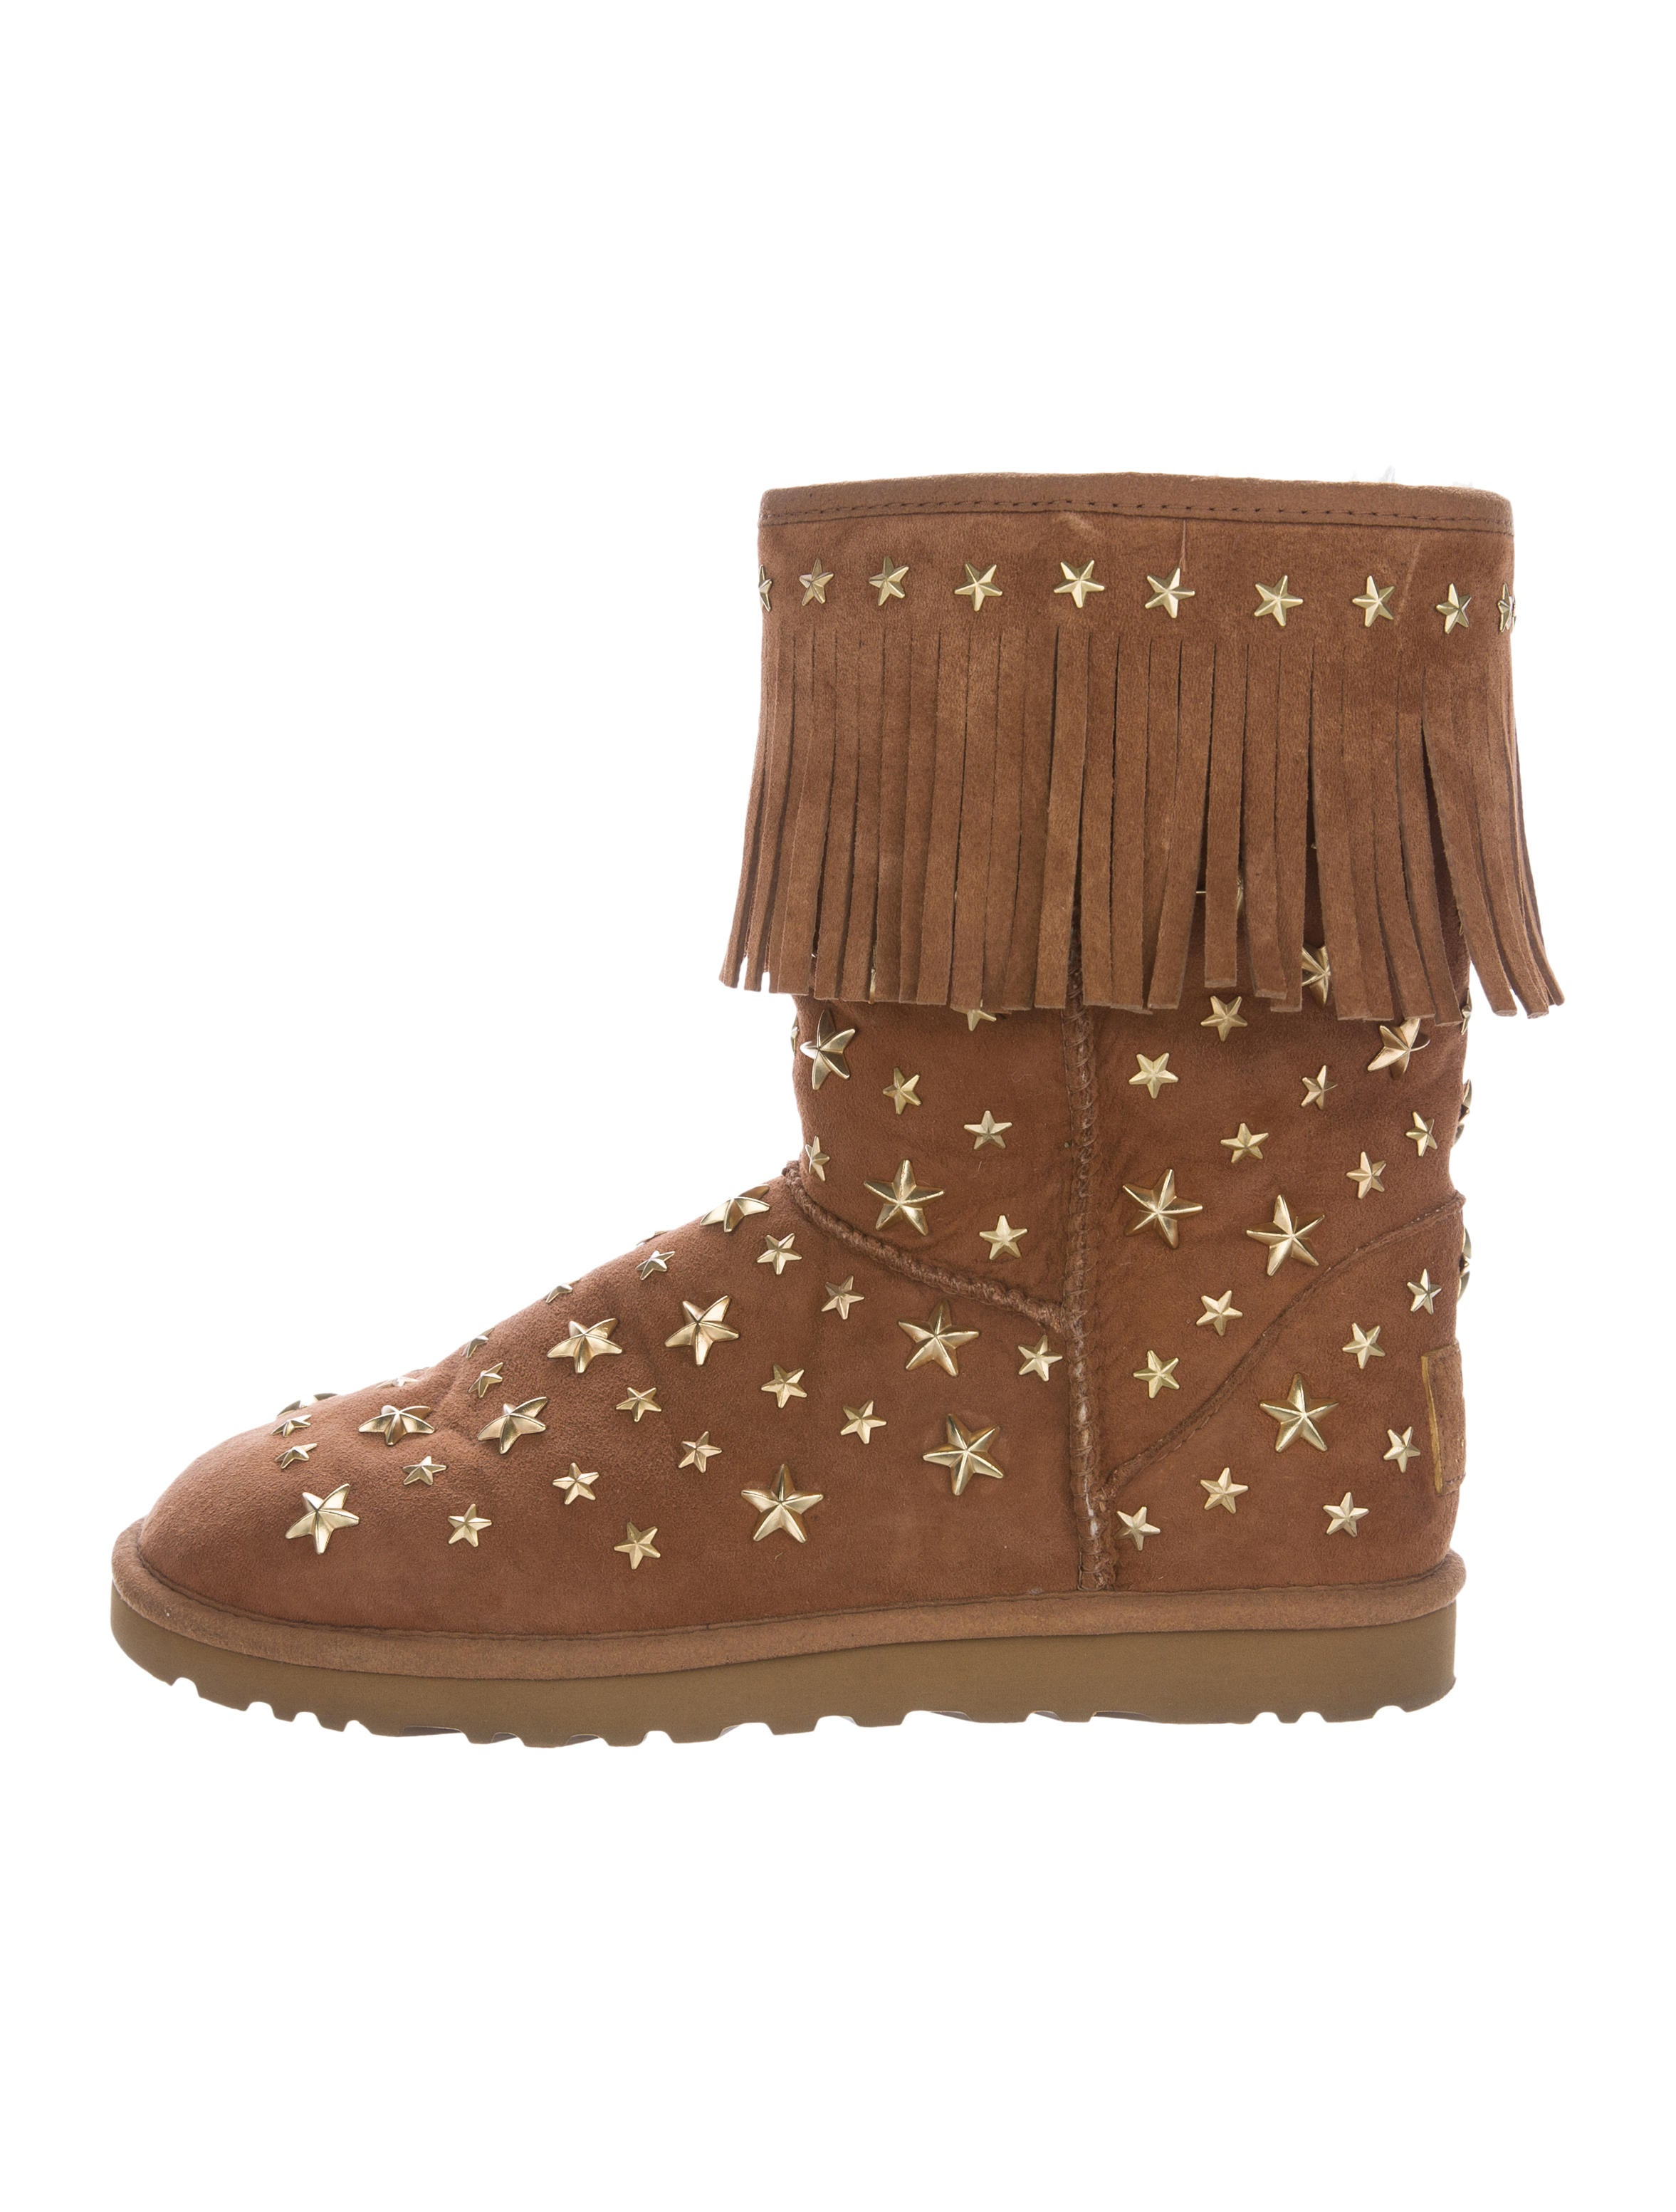 213ec2ae119d Jimmy Choo Ugg Star Boots